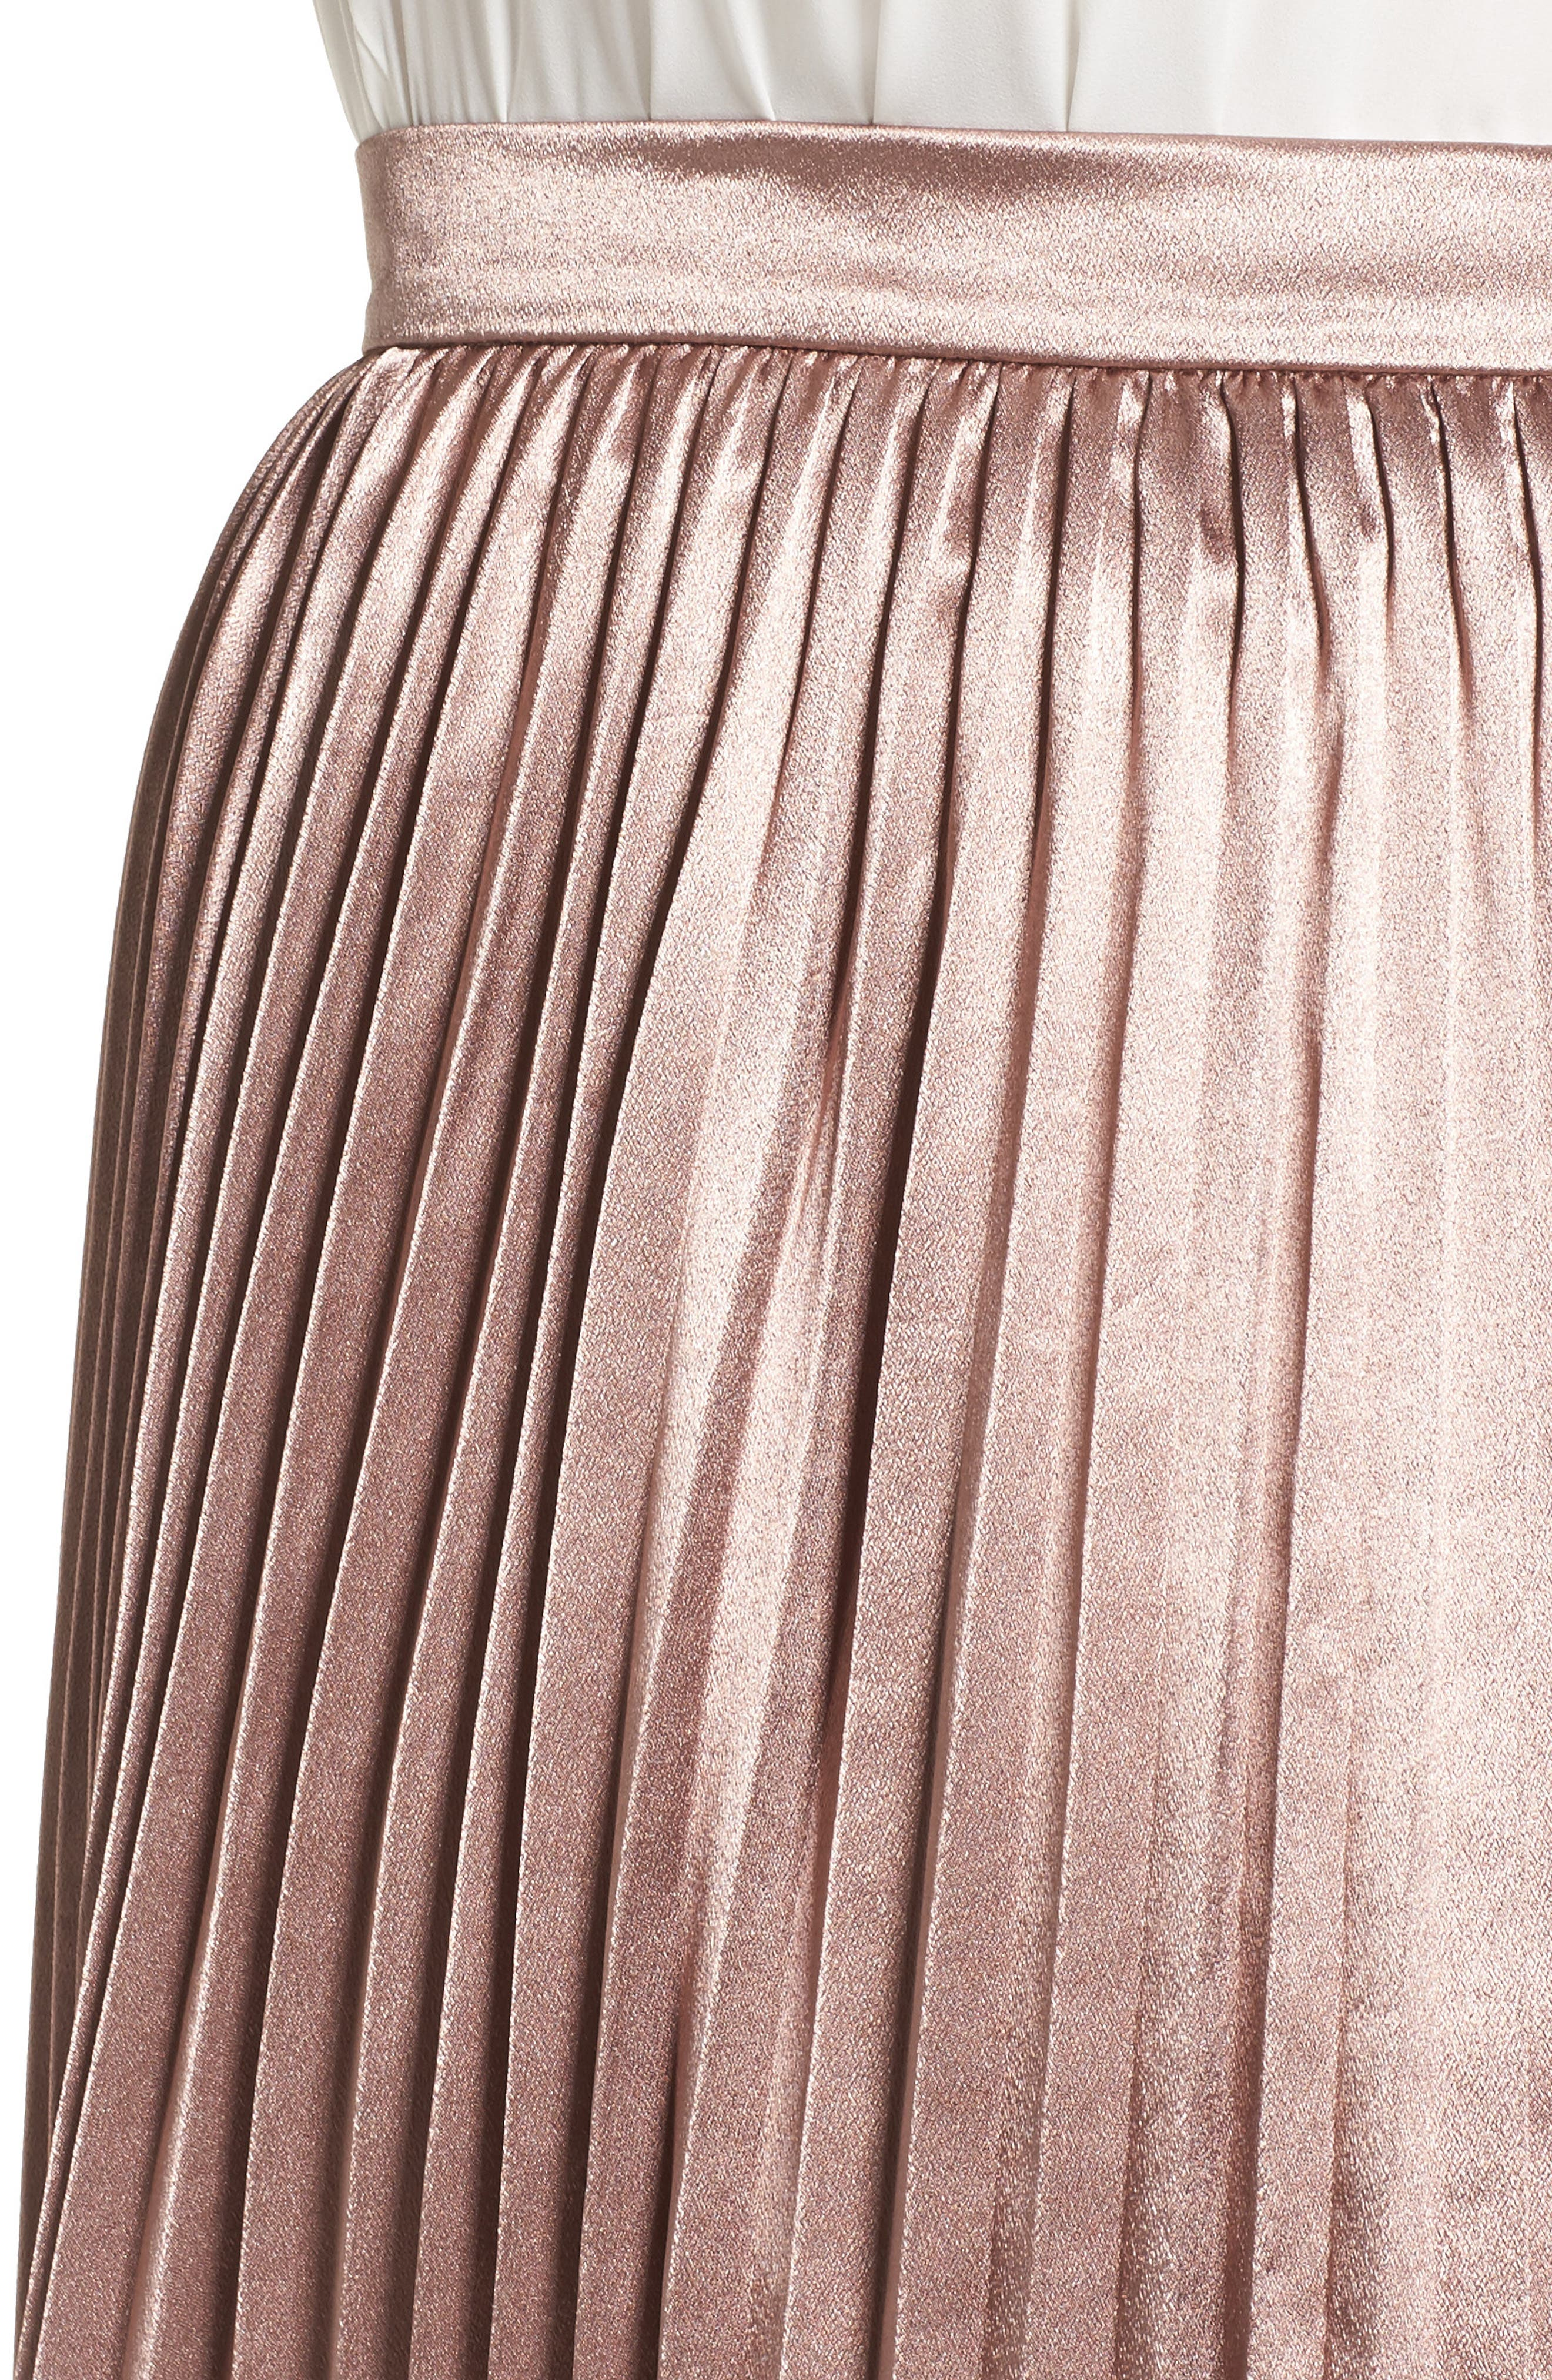 Alternate Image 4  - LOST INK Pleat Metallic Skirt (Plus Size)